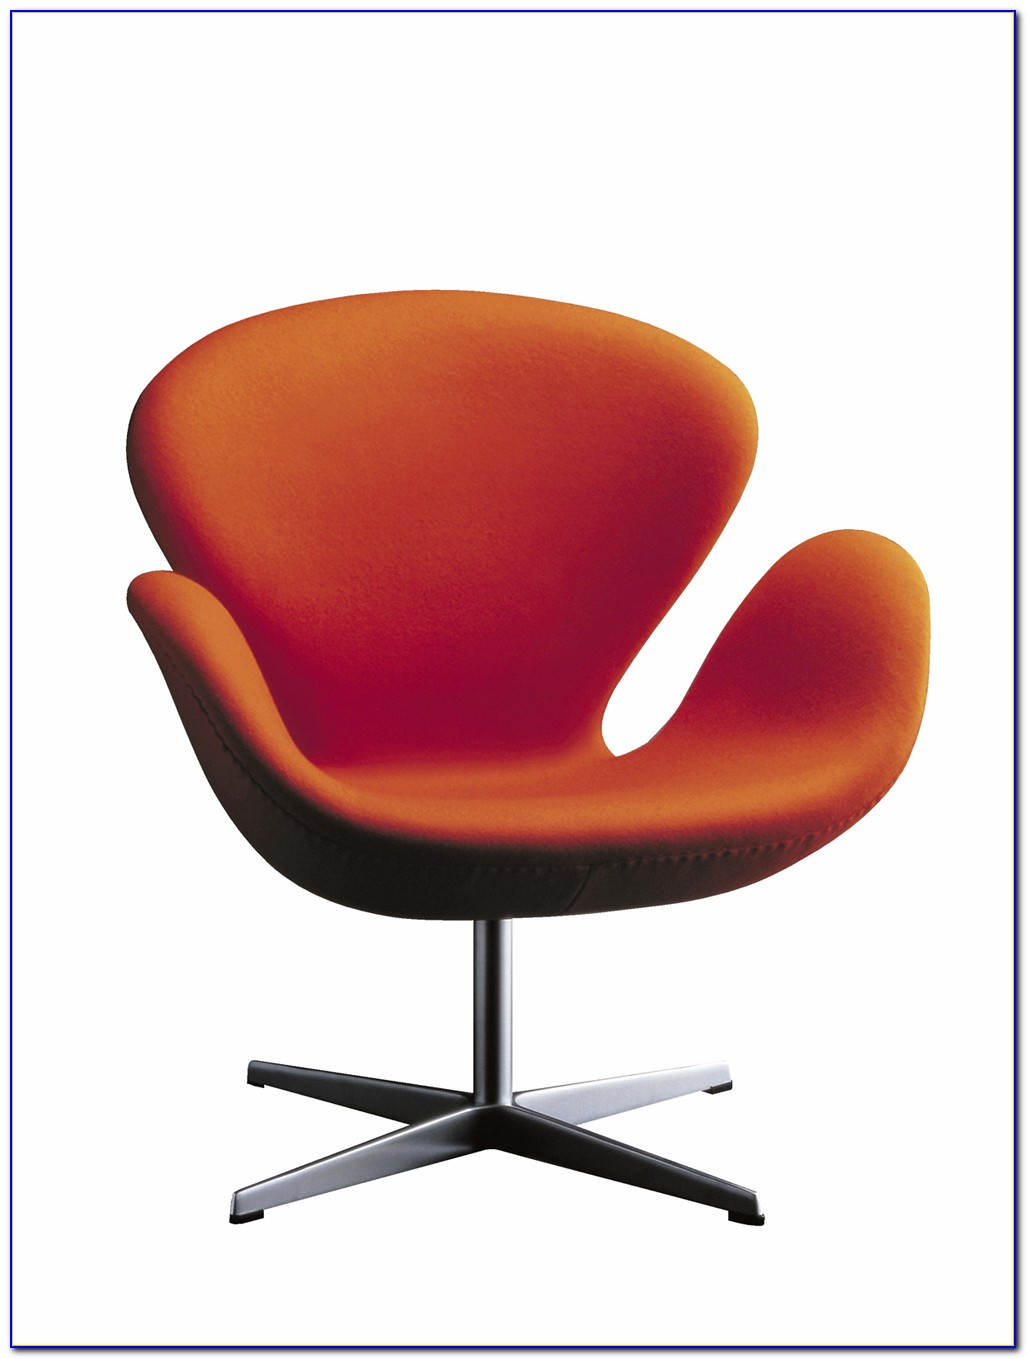 Arne Jacobsen Möbel Hamburg